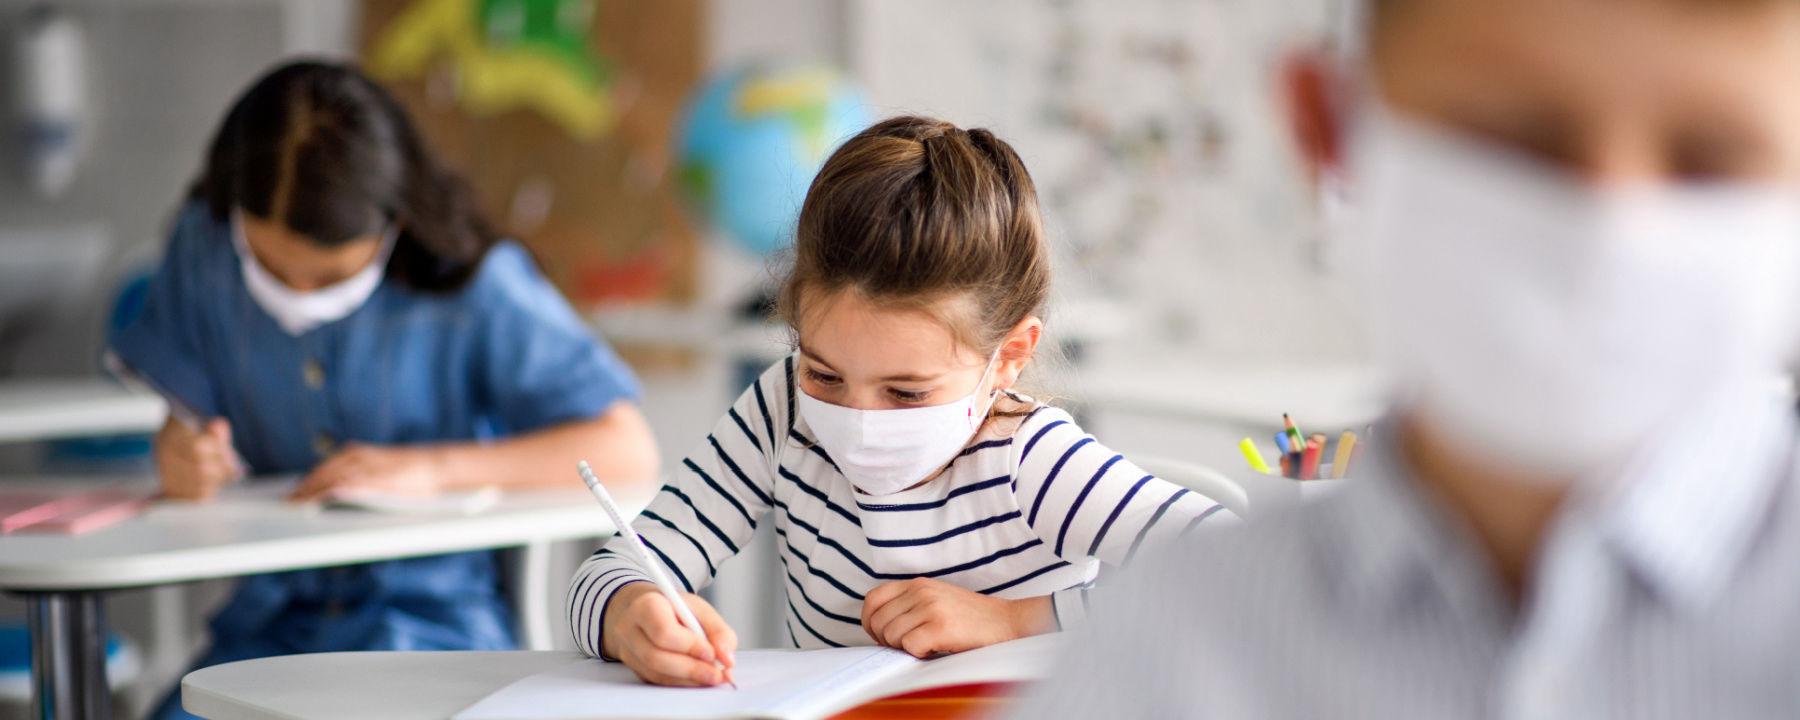 COVID-19 Symptoms in Kids Most Often Headache, Fever: App Data